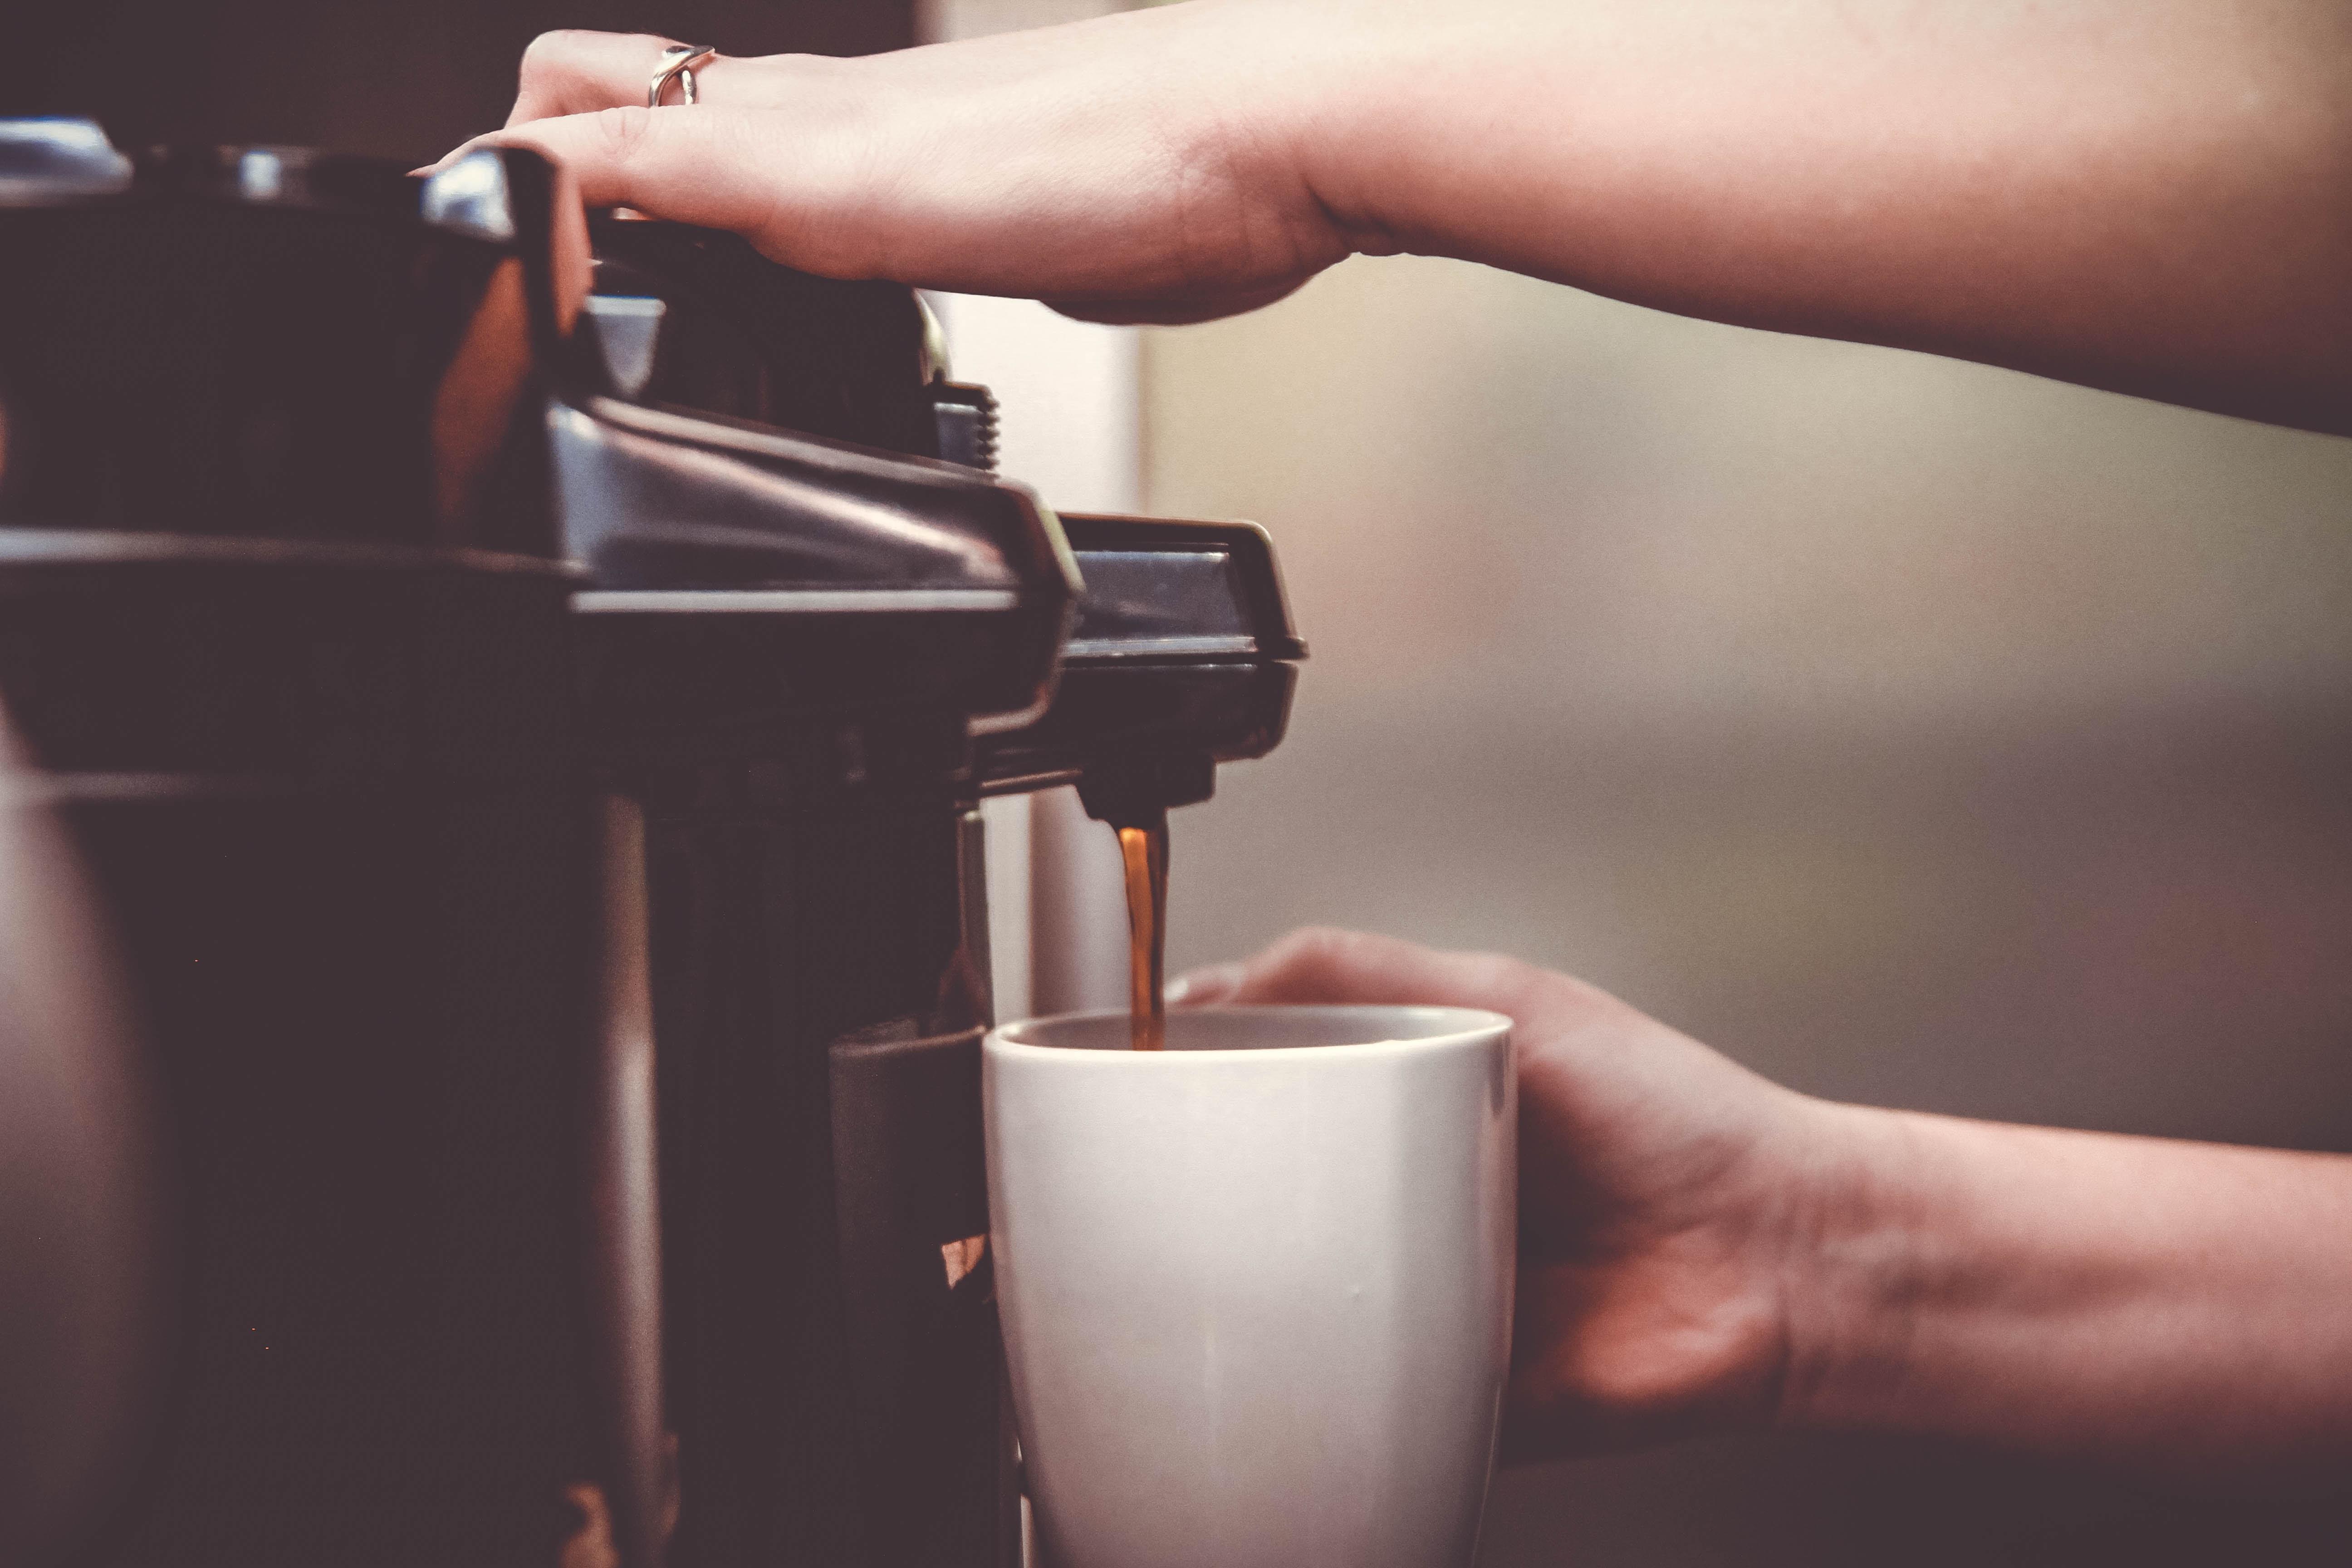 person using coffeemaker with white ceramic mug